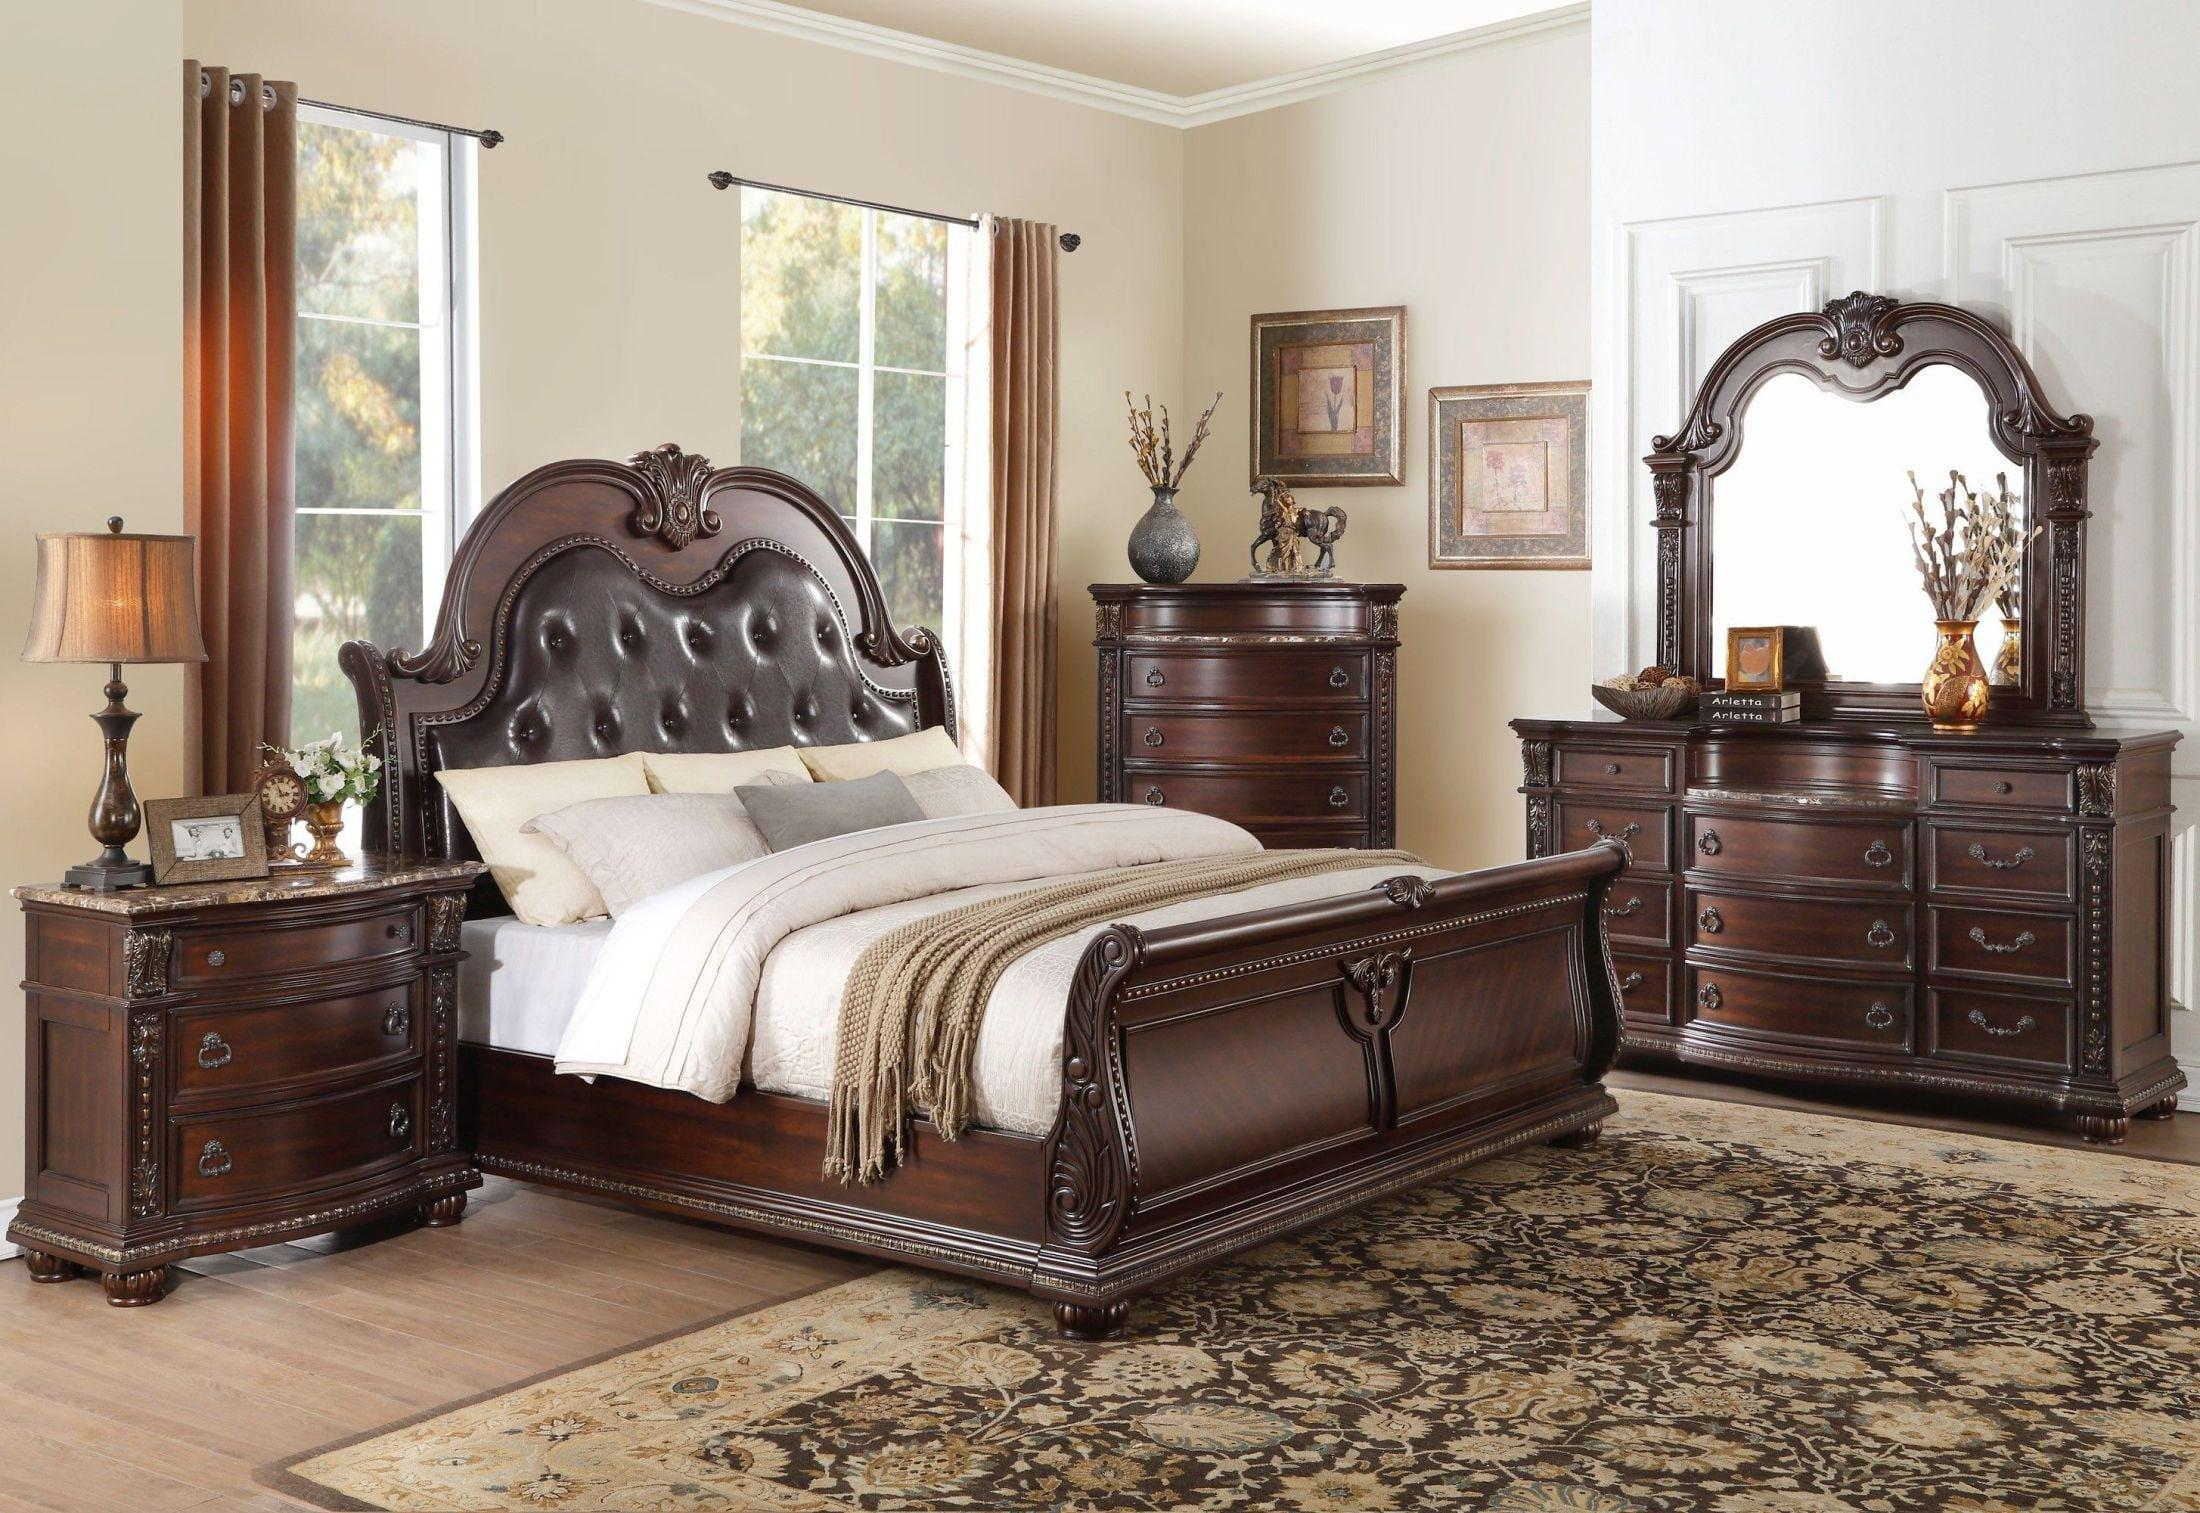 Cavalier Dark Cherry Sleigh Bedroom Set from Homelegance | Coleman ...